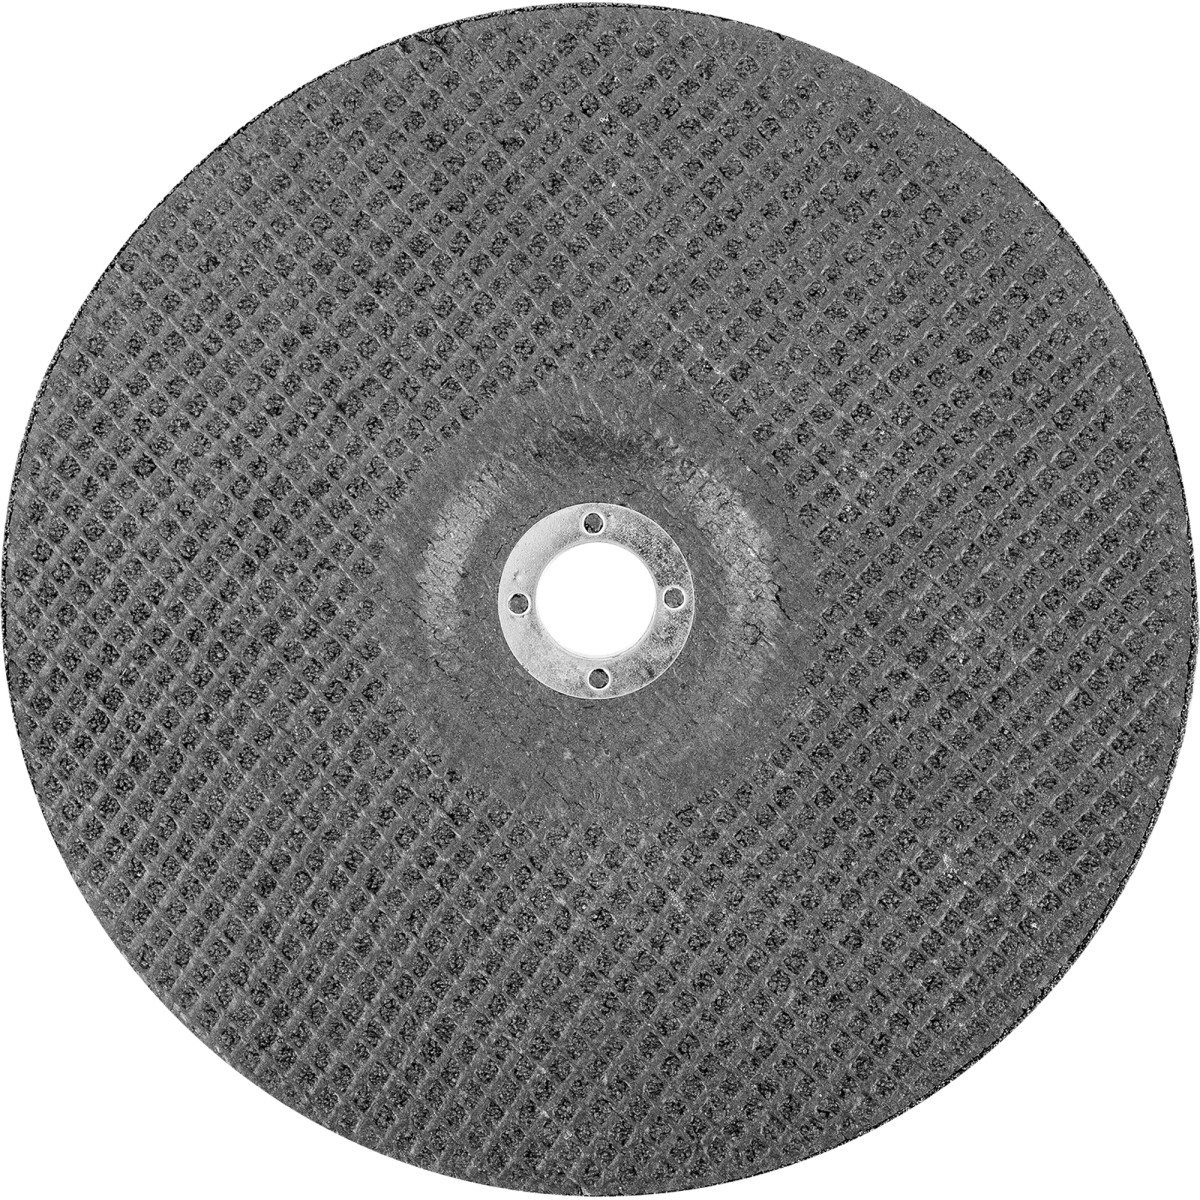 Абразивный круг по камню Metabo Flexiamant Super D230 мм